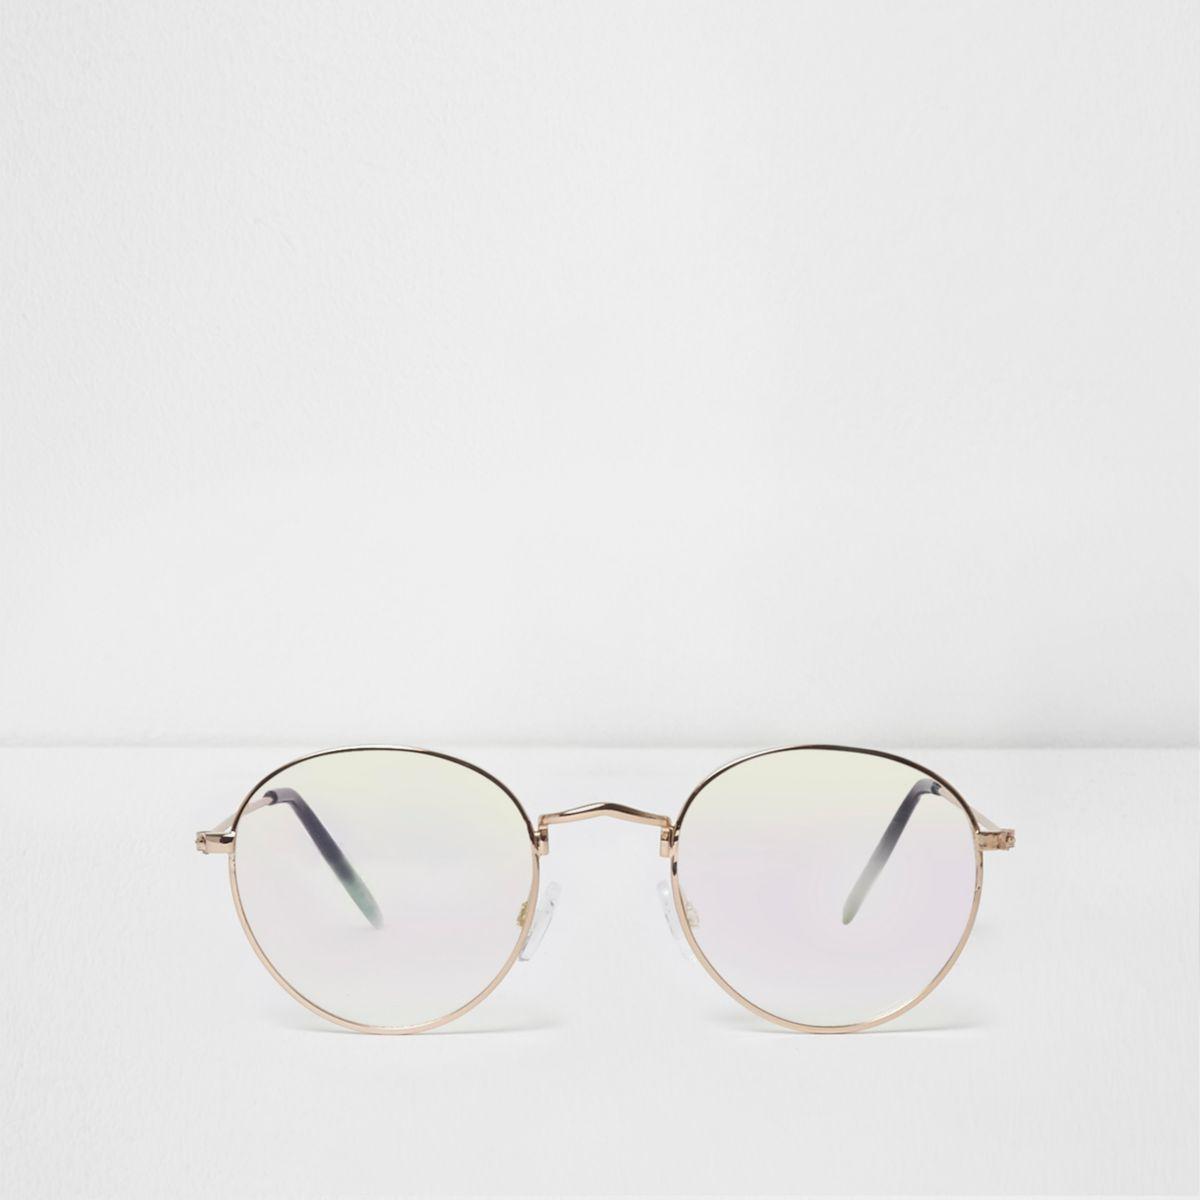 Gold tone clear lenses aviator sunglasses